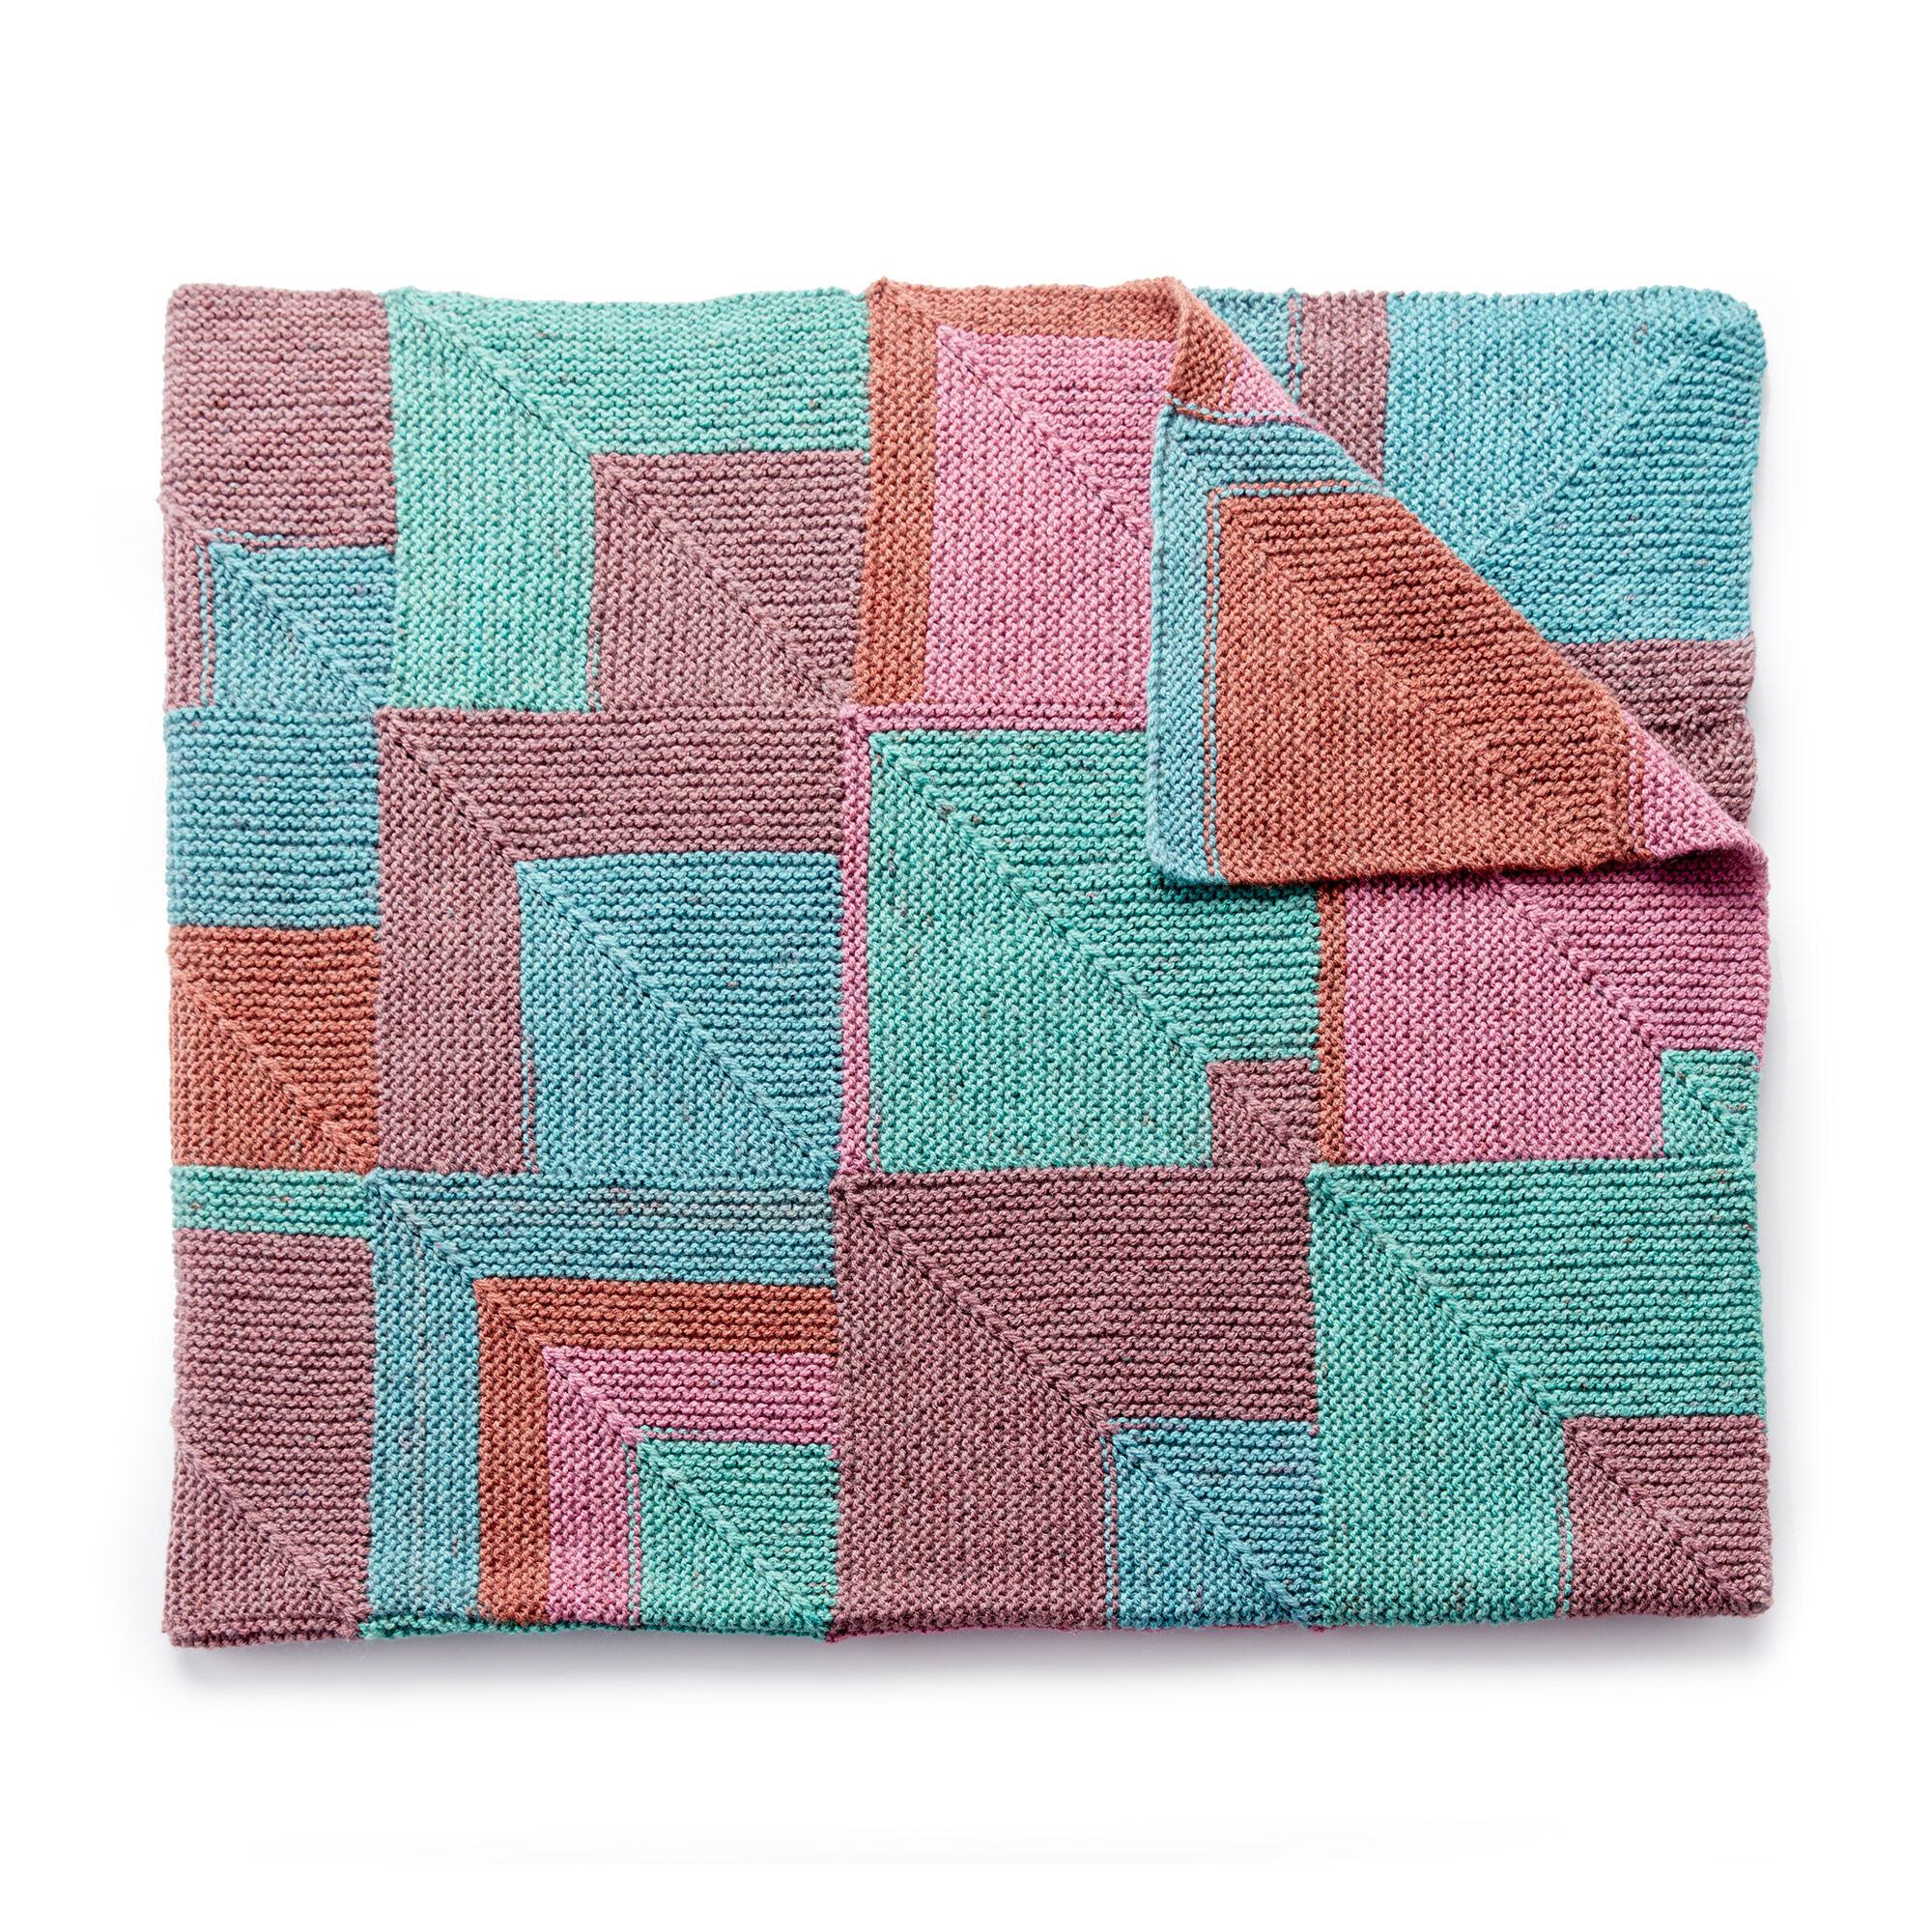 Caron Stack it Up Knit Afghan Pattern | Yarnspirations | Yarnspirations